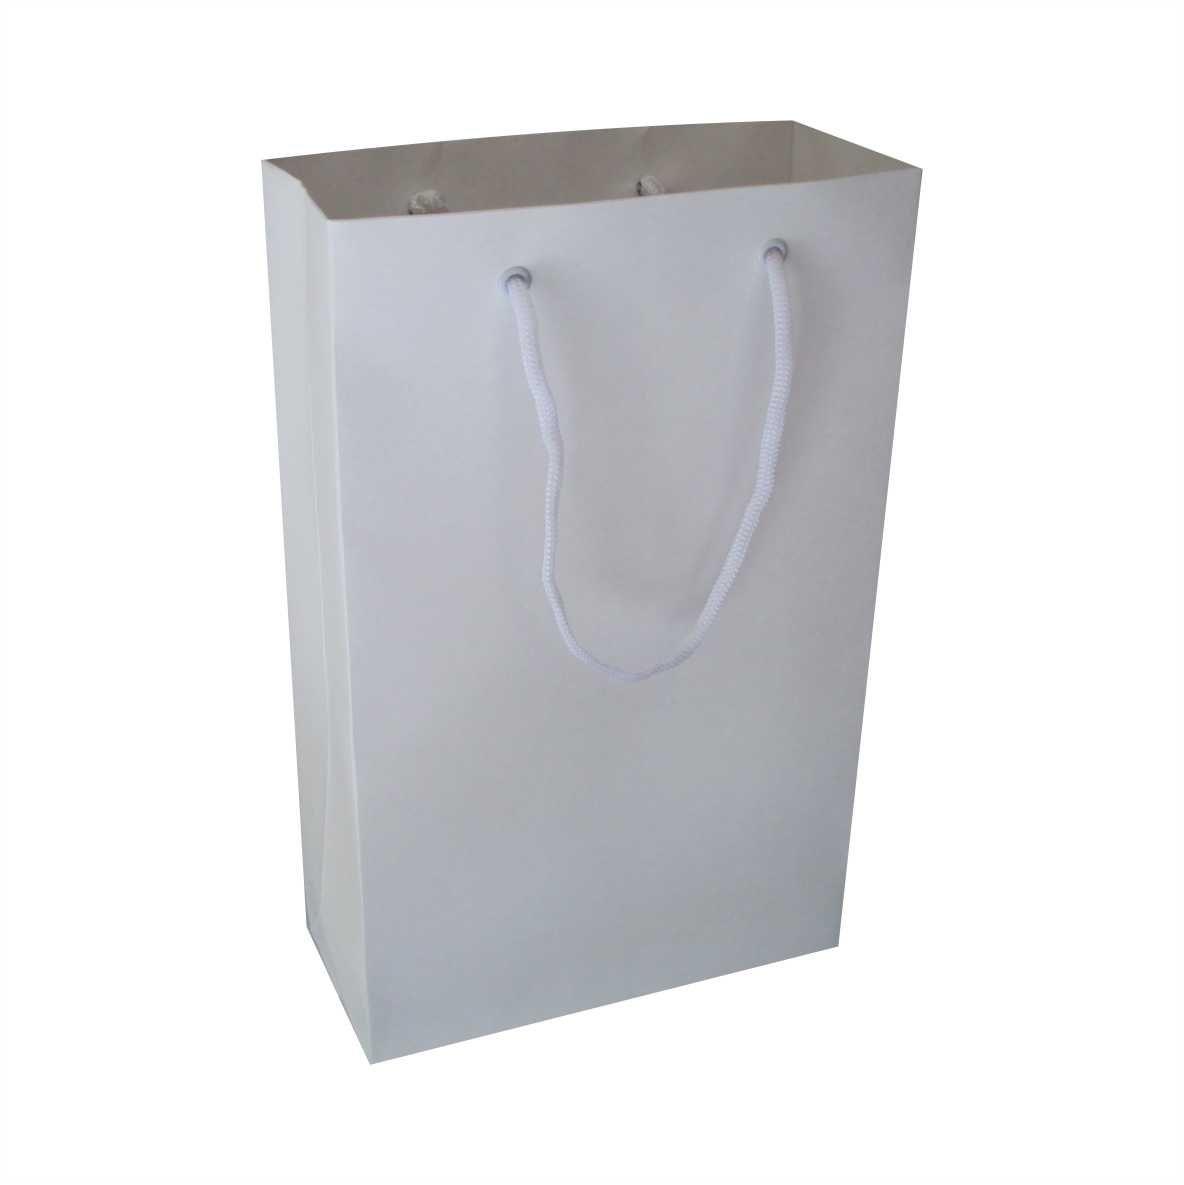 Sacola branca media (18x29x8 cm) - 10 unidades